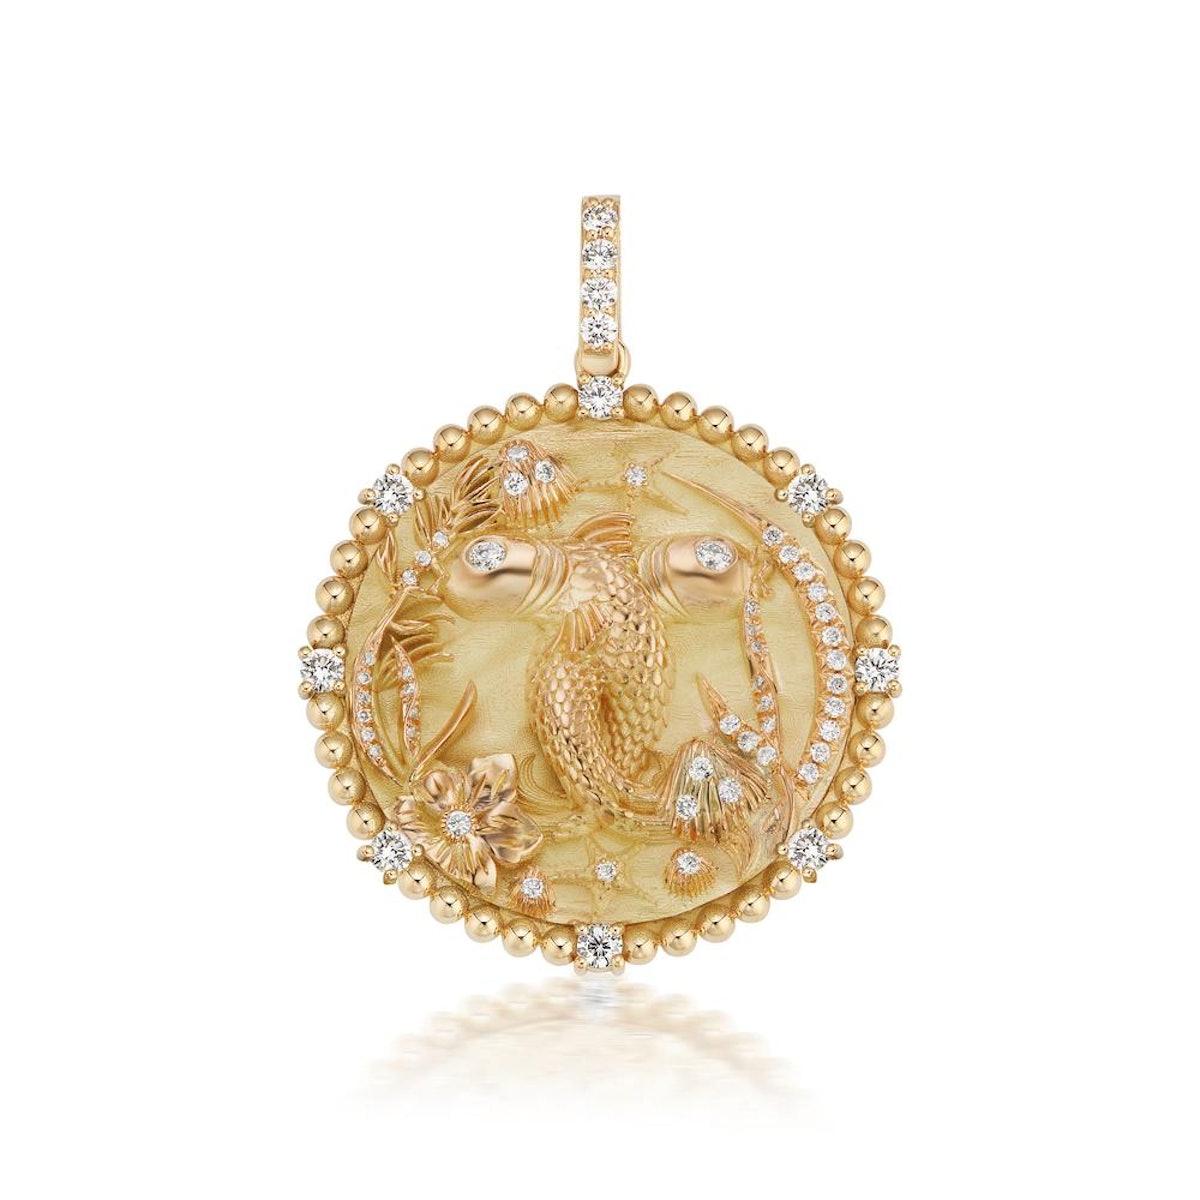 Jumbo Pisces Zodiac Medallion 18k Yellow Gold by Briony Raymond.